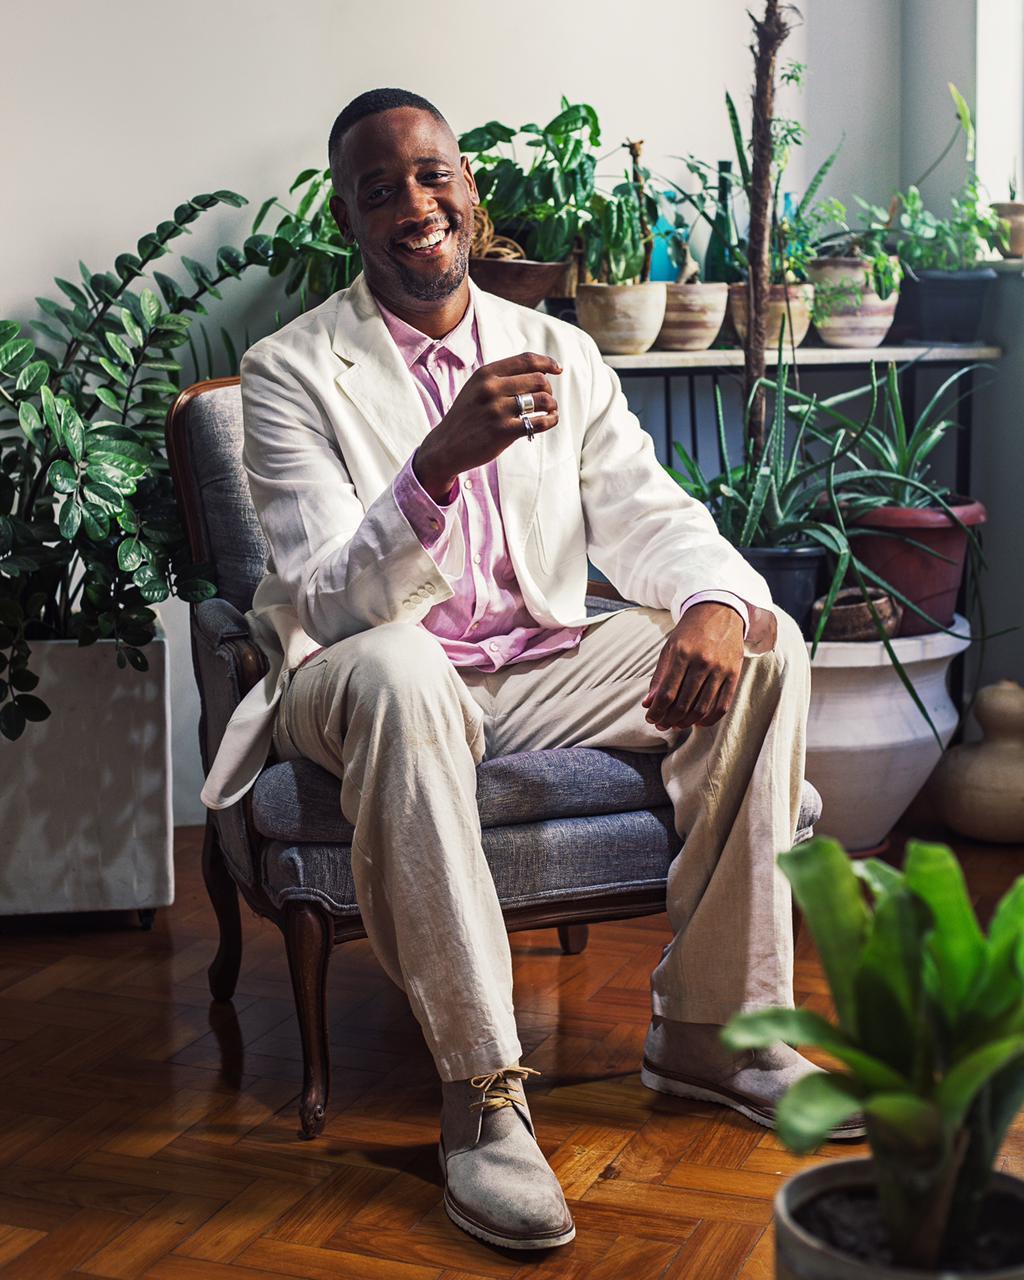 Conheça Matheus Almeida, chef baiano discípulo de Dadá que vai sorrir e brilhar na Globo